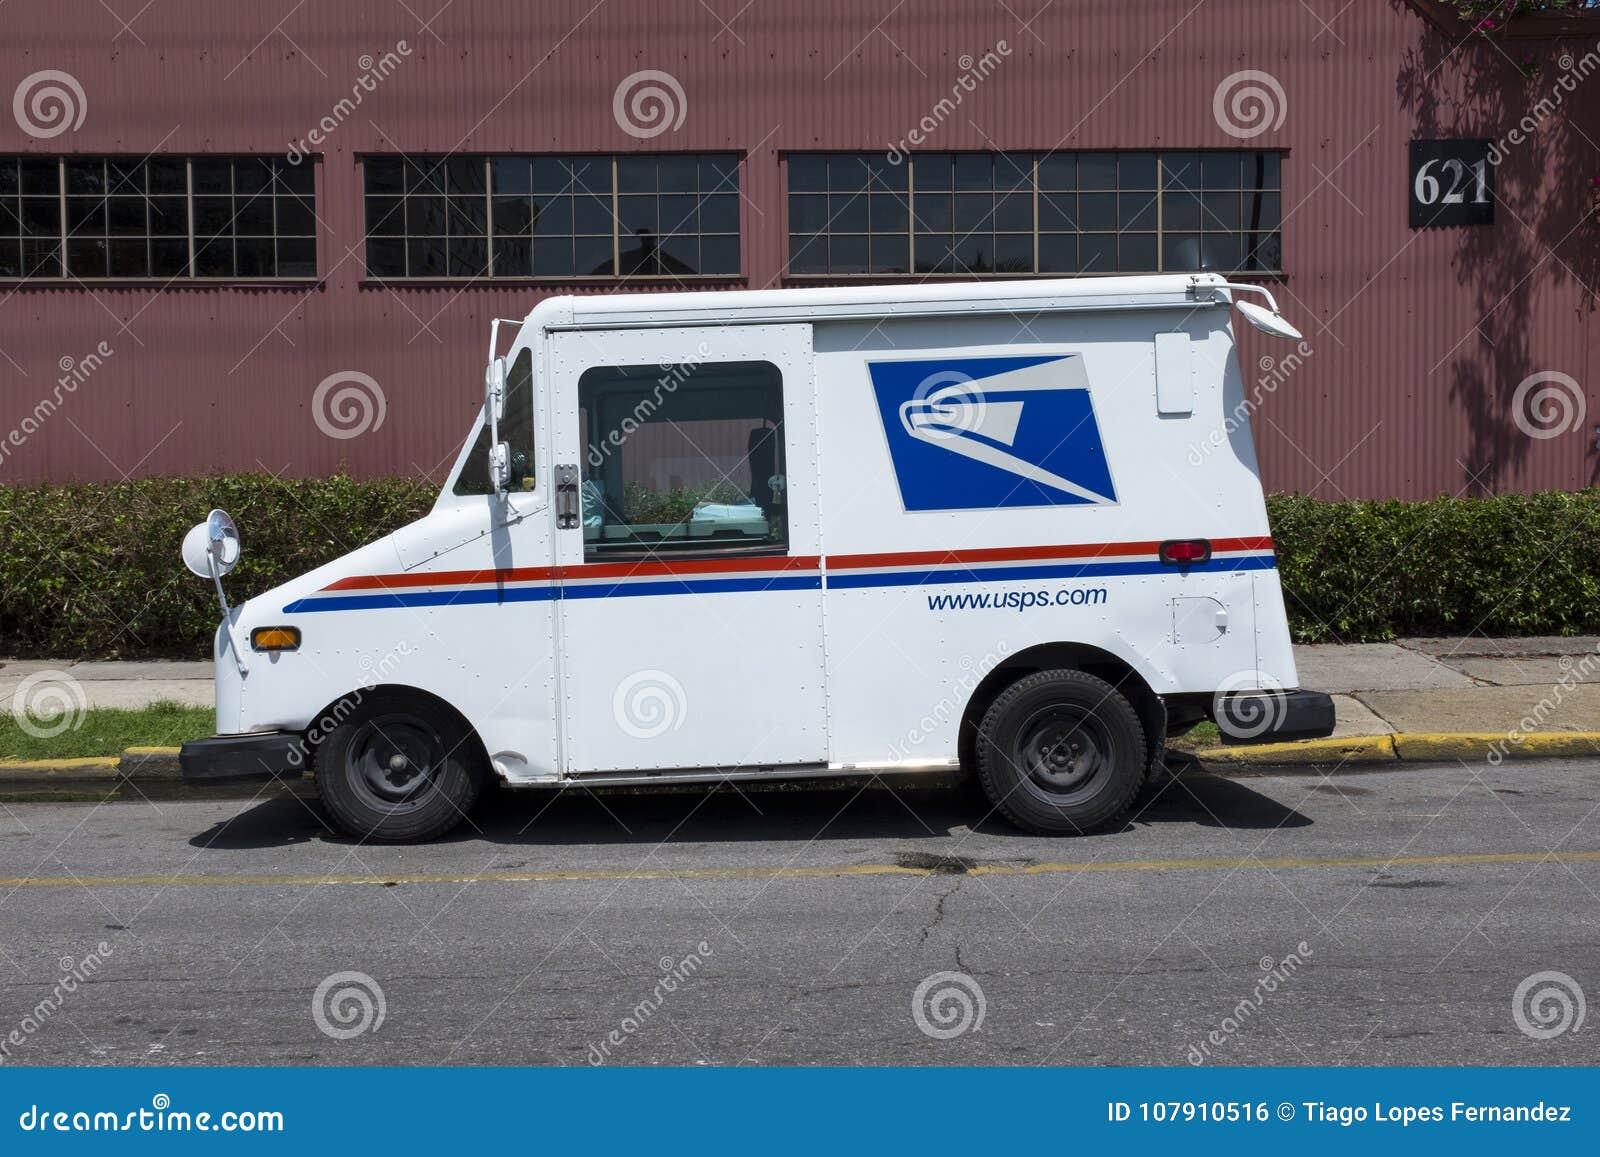 New Usps Truck